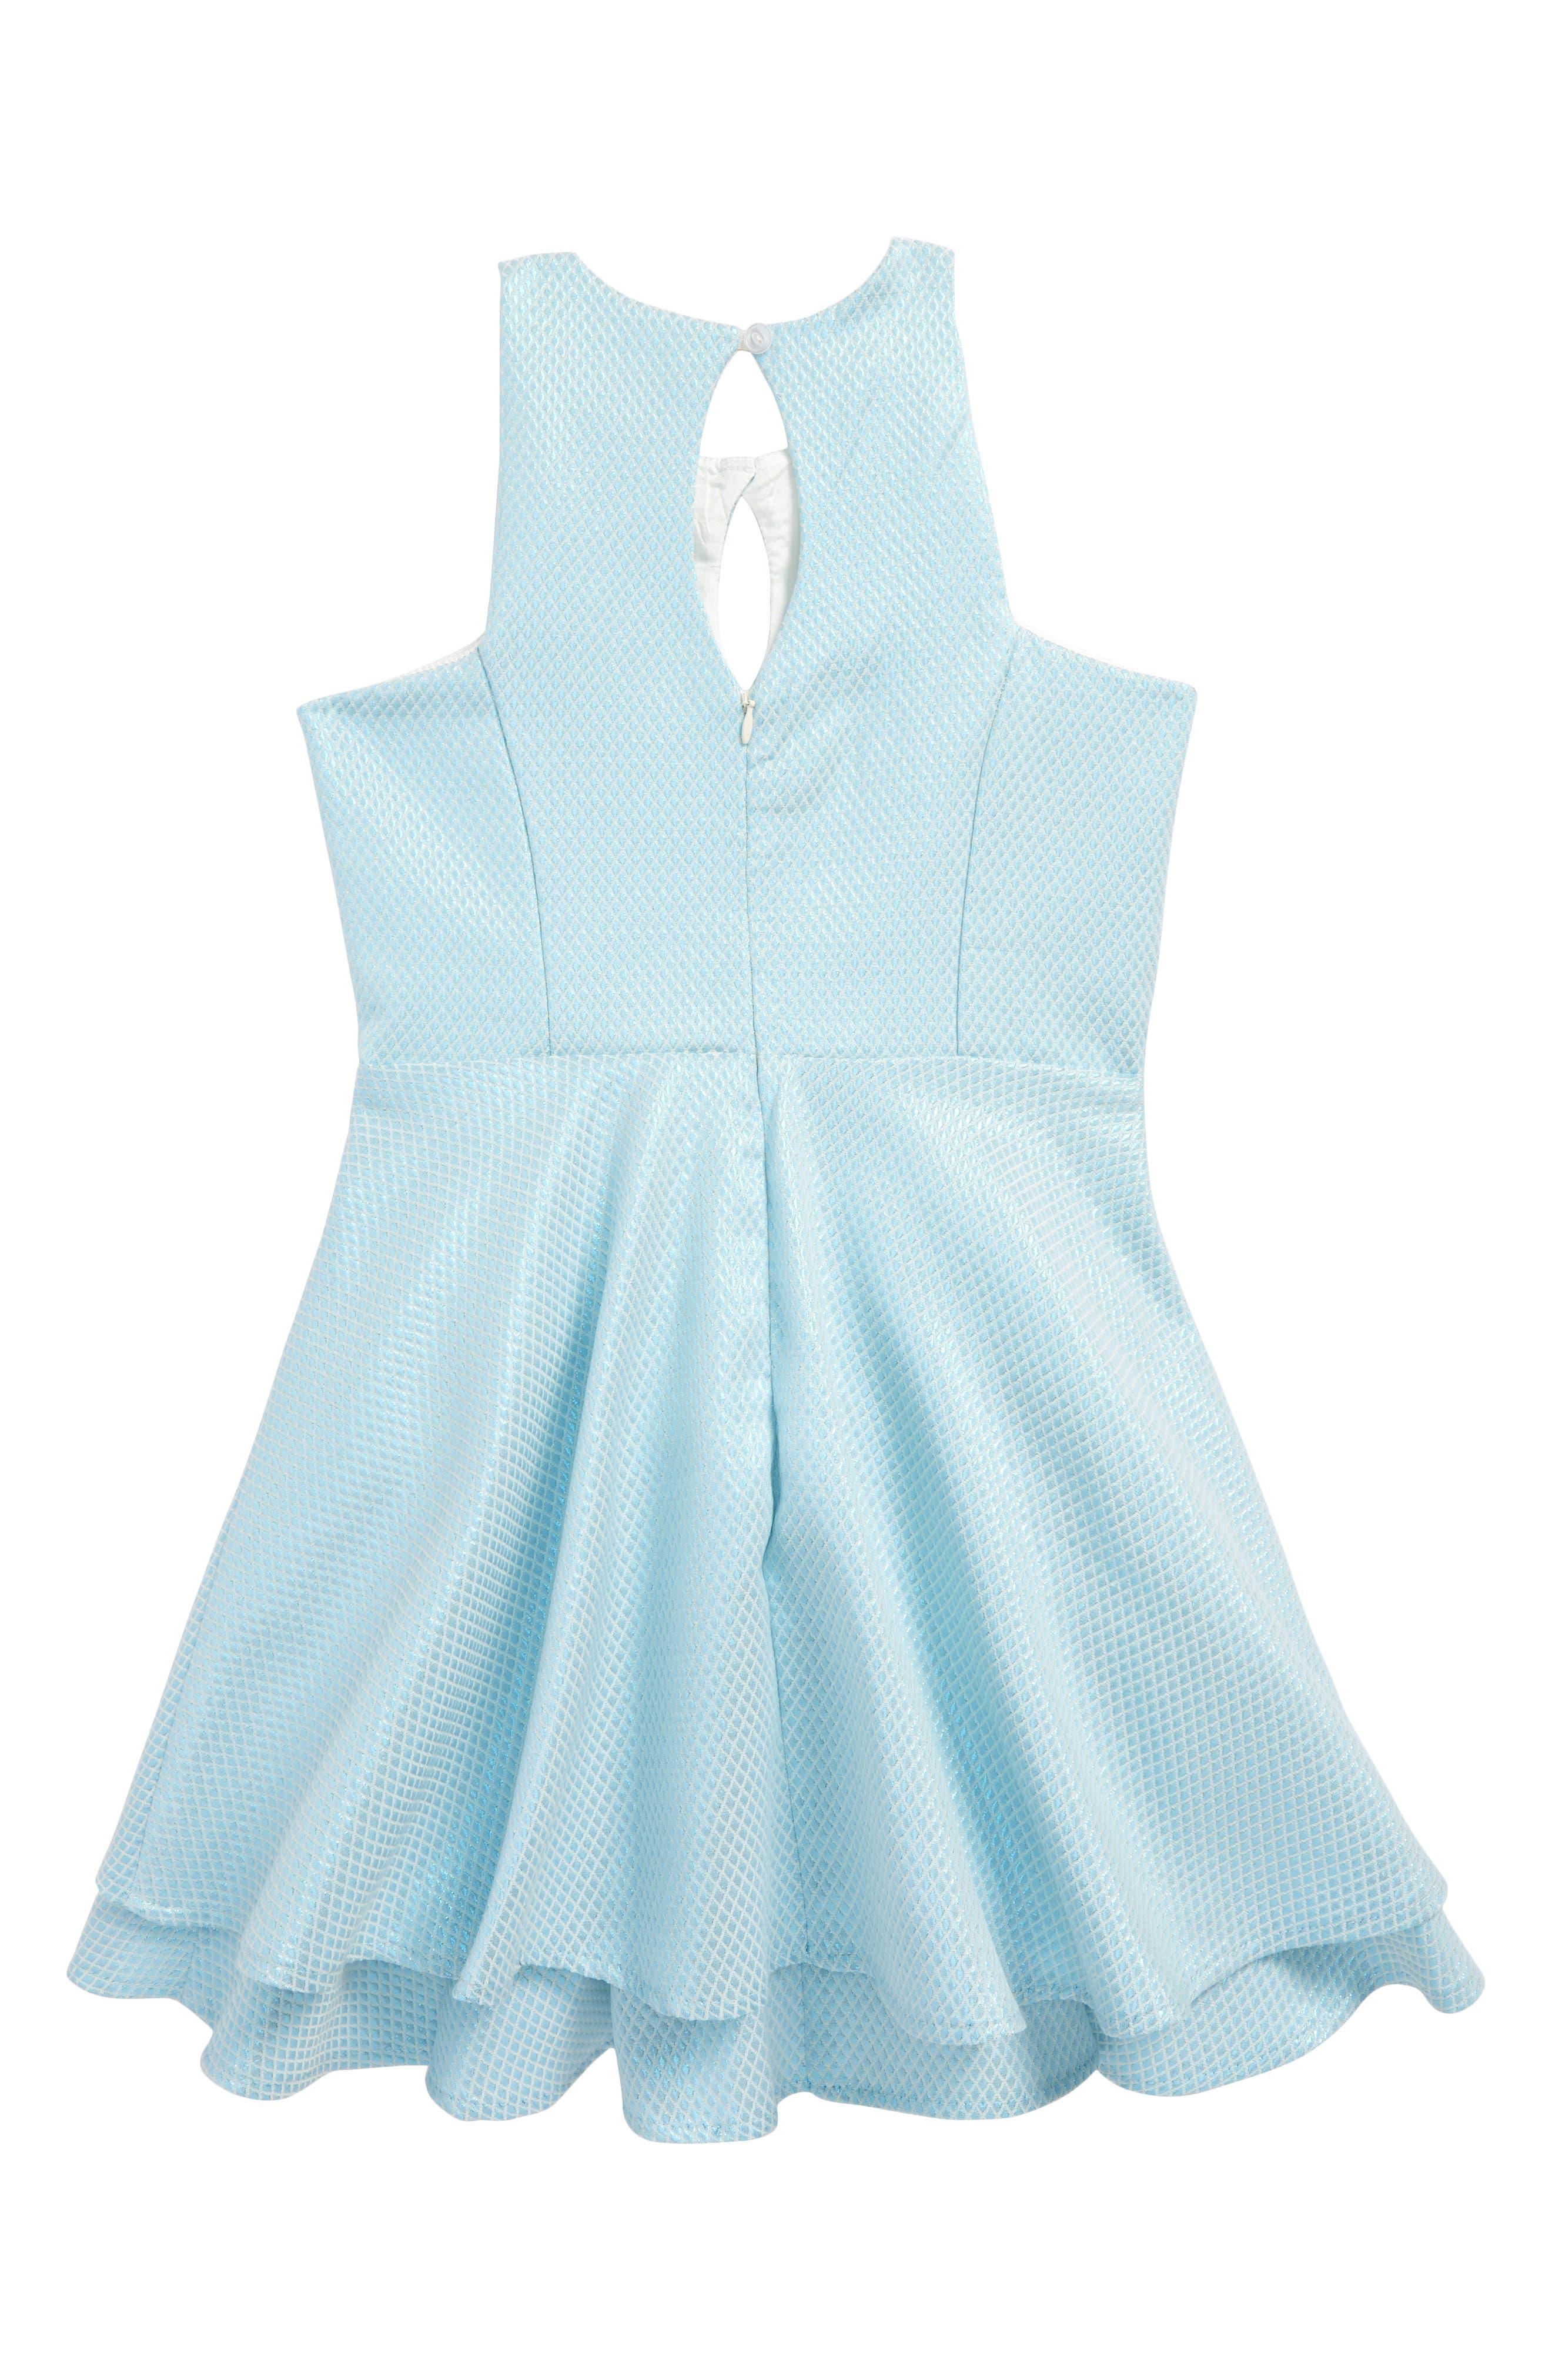 Sleeveless Party Dress,                             Alternate thumbnail 2, color,                             Blue